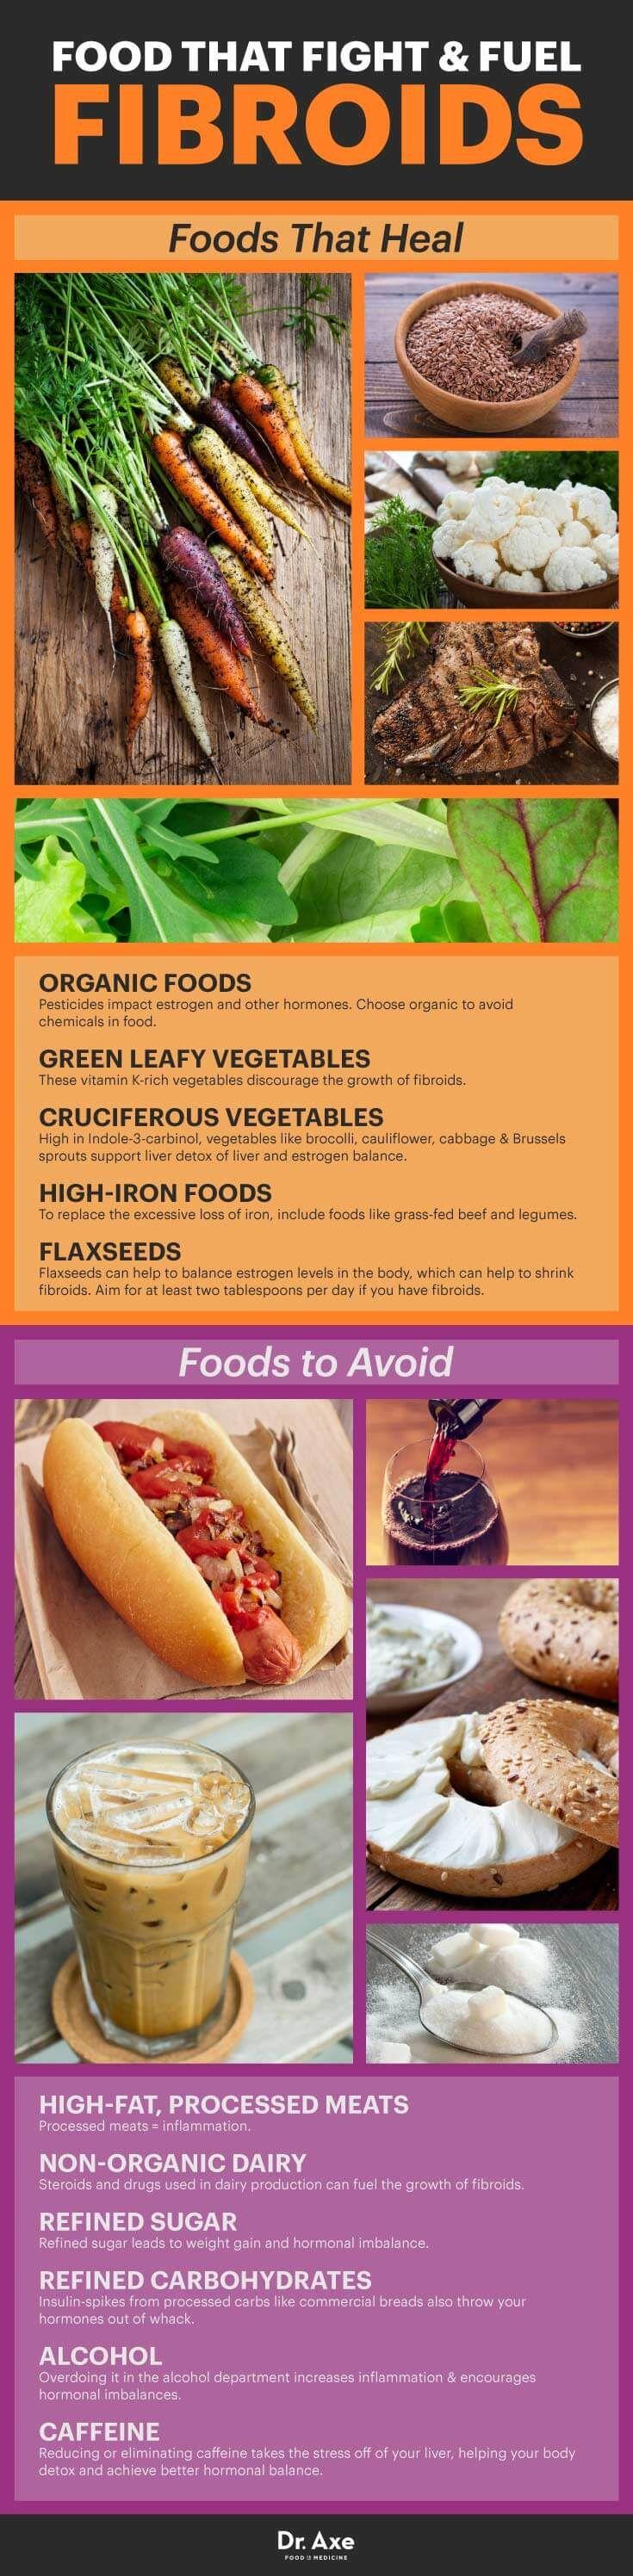 Fibroids - Dr. Axe http://www.draxe.com #health #holistic #natural